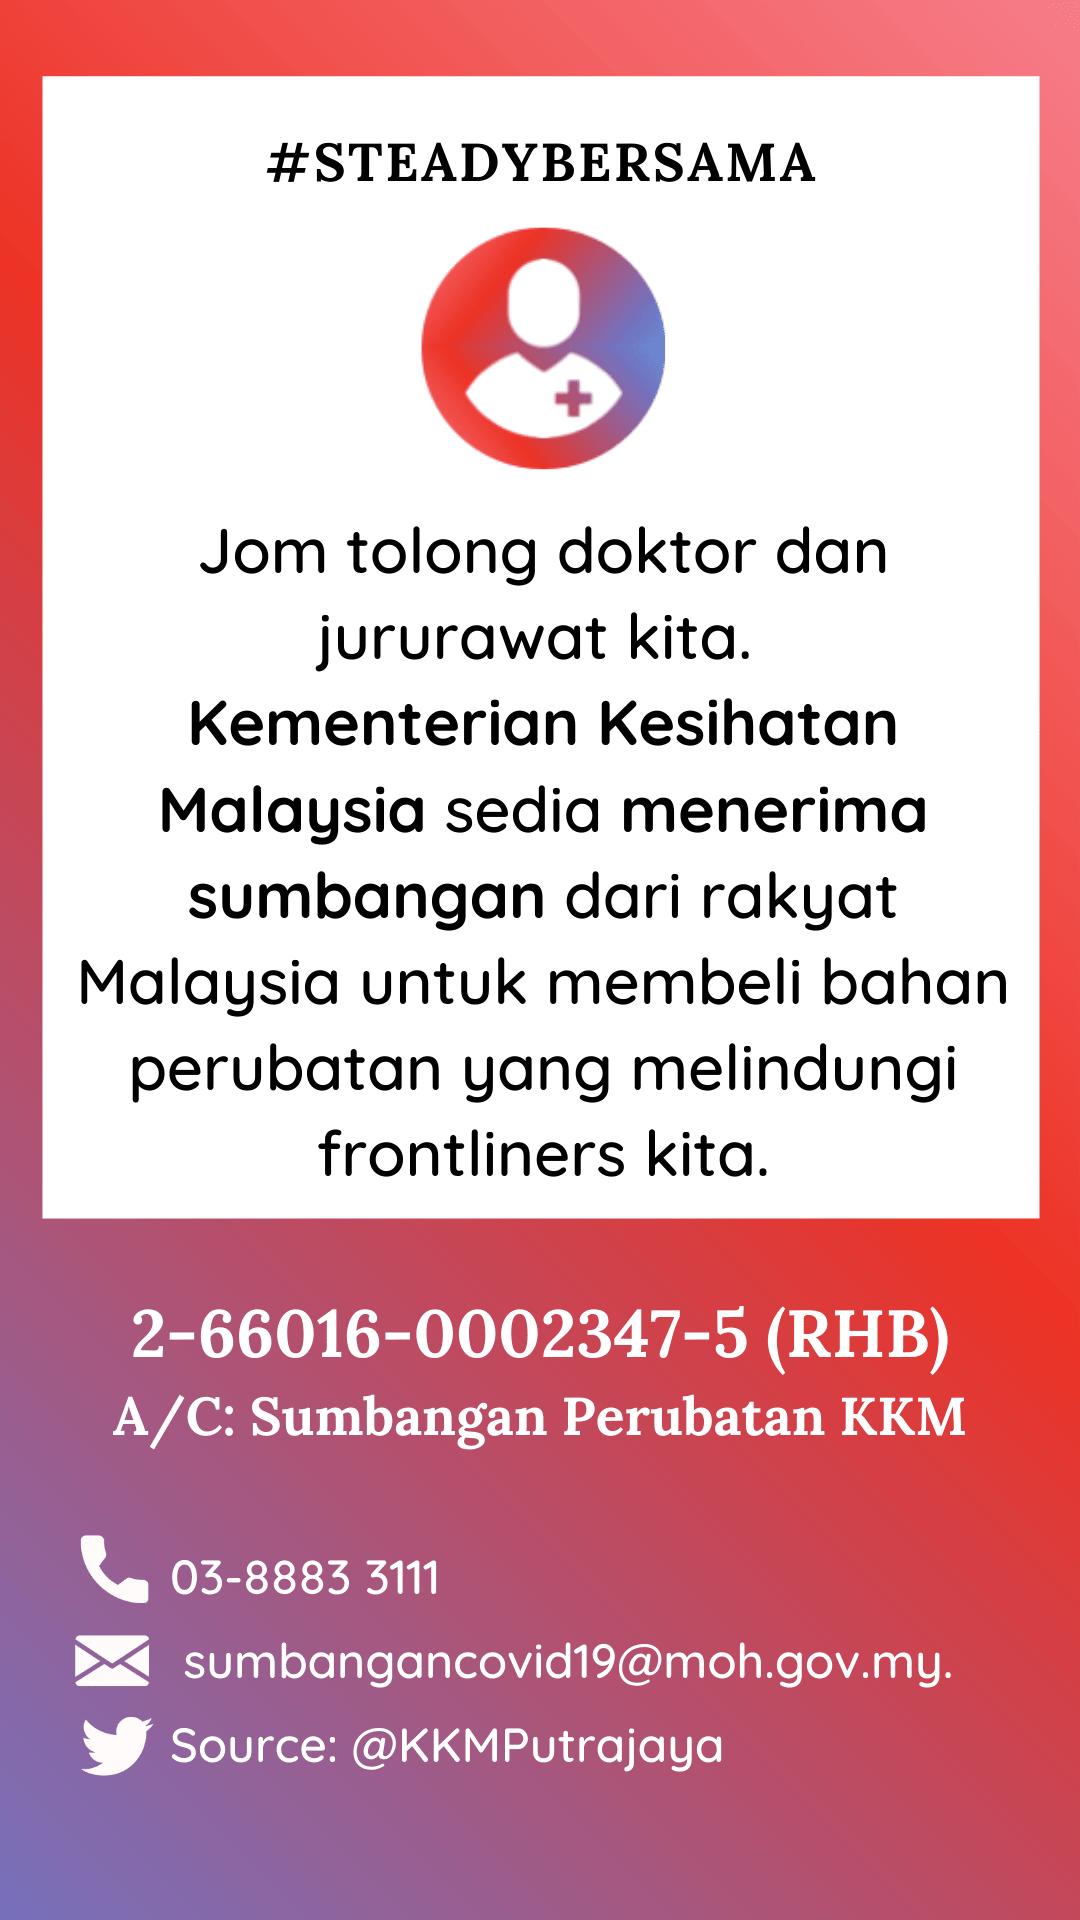 Material - SushiVid+Covid+19+Aid+-+donation+(Malay)